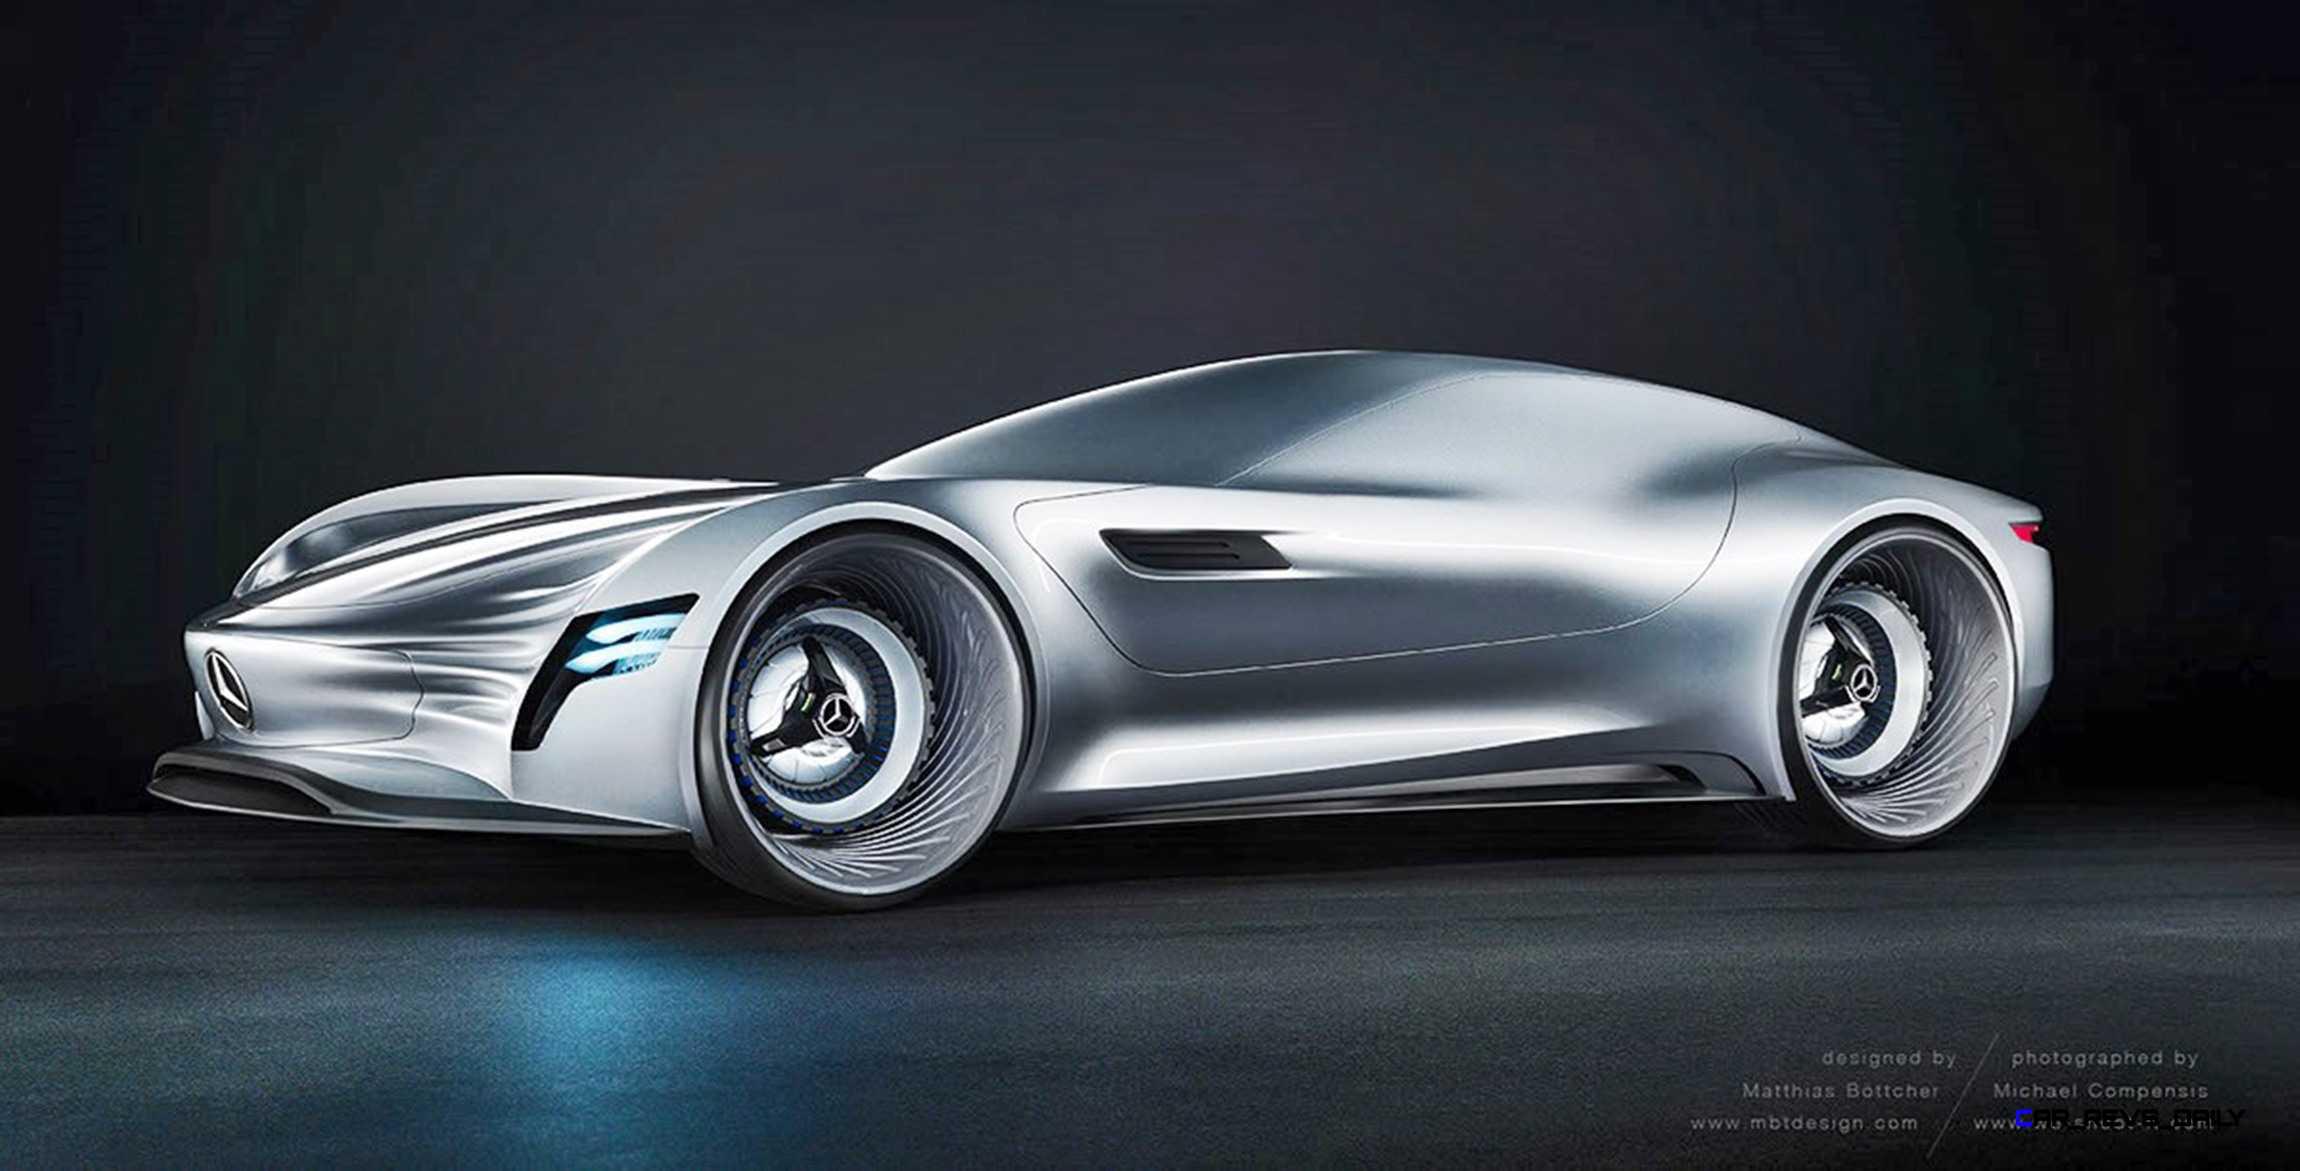 35 Best Review Mercedes New Conceptlen 2020 Performance with Mercedes New Conceptlen 2020